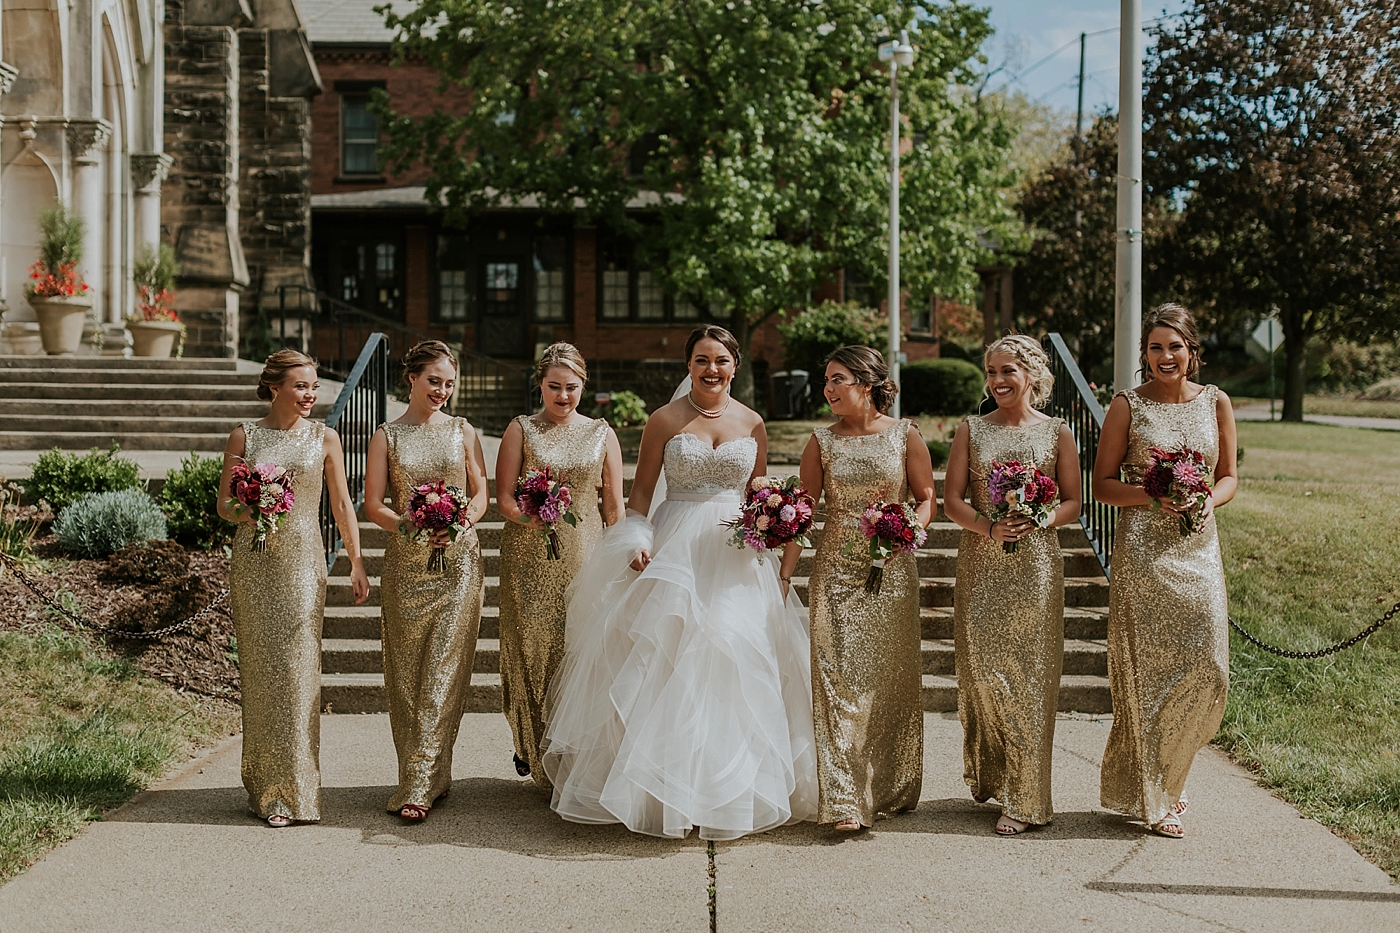 Ohio-Wedding_Kathryn+Devin_MJPHOTO2017-279.jpg